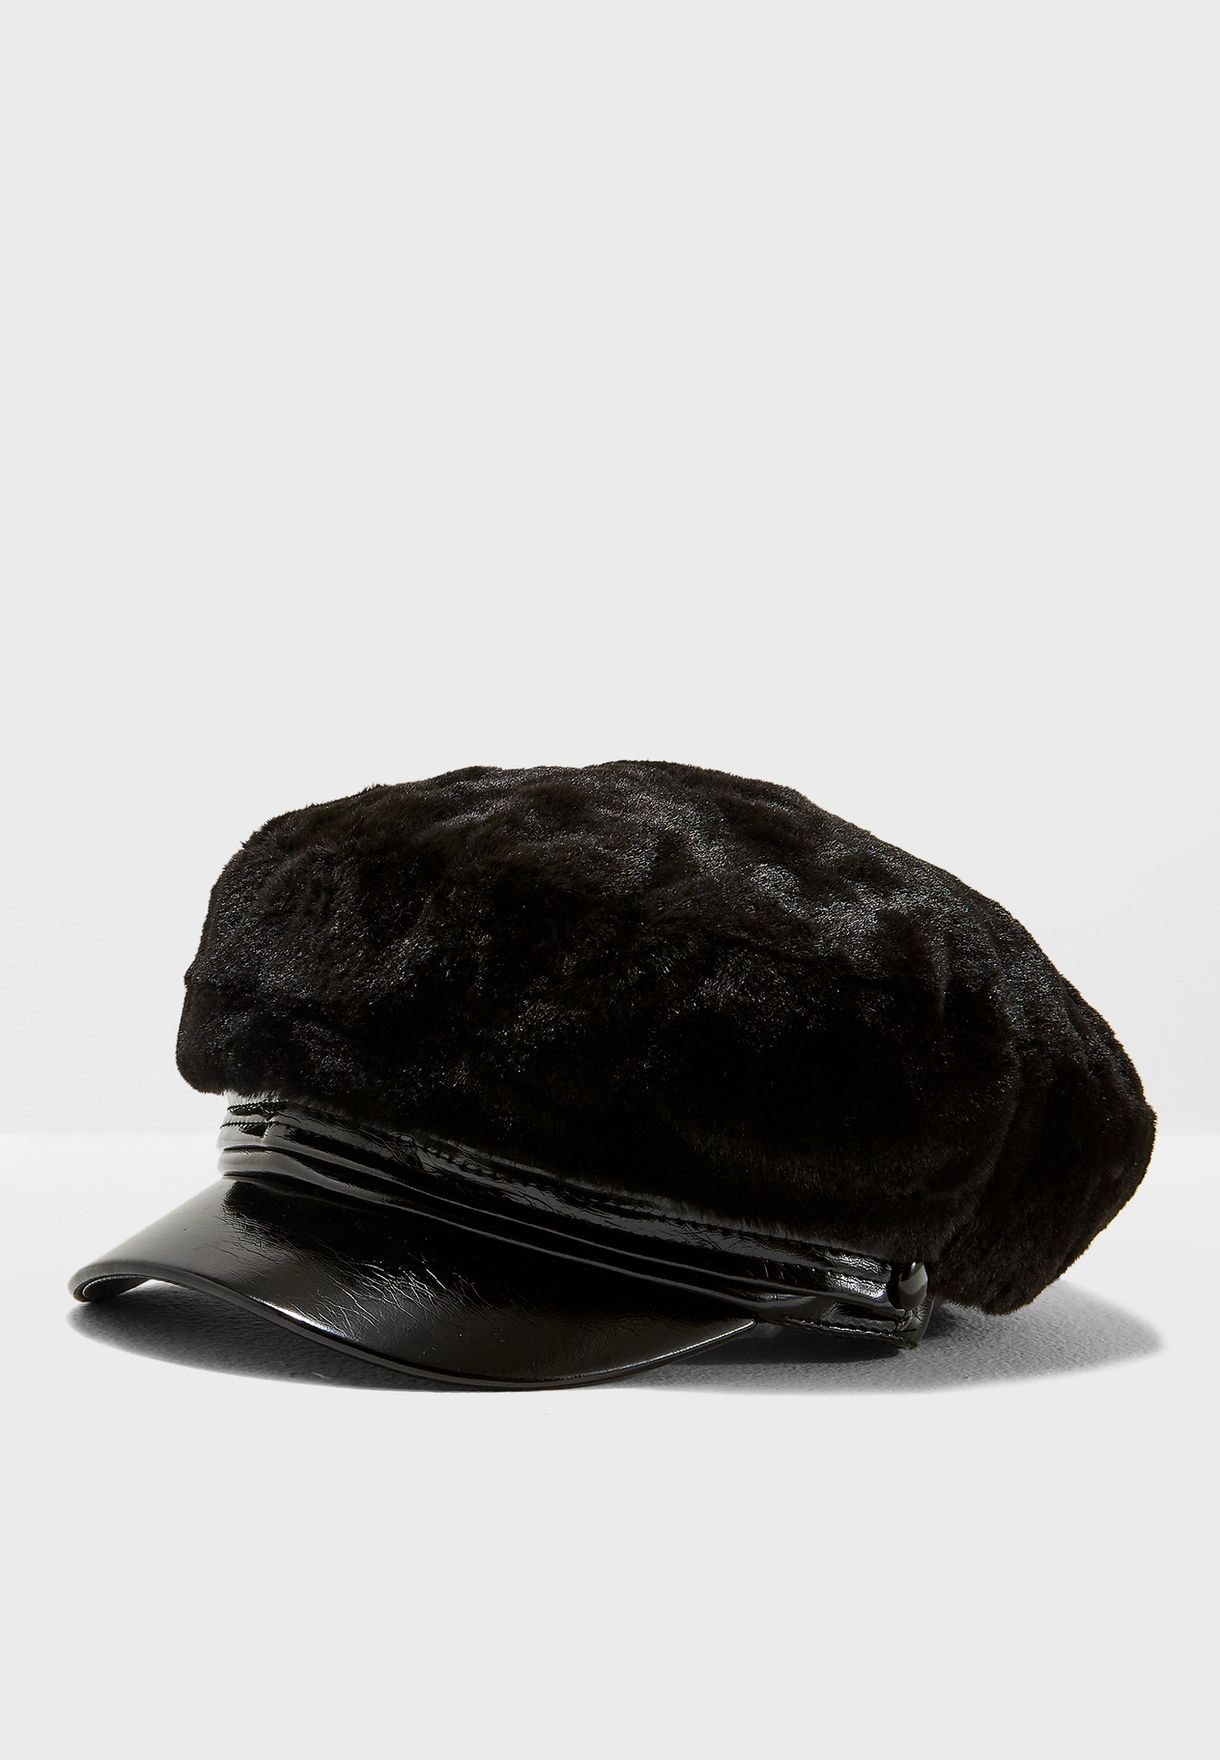 d97eaedf0f8 Shop Topshop black Faux Fur Baker Boy Hat 19K88NBLK for Women in ...